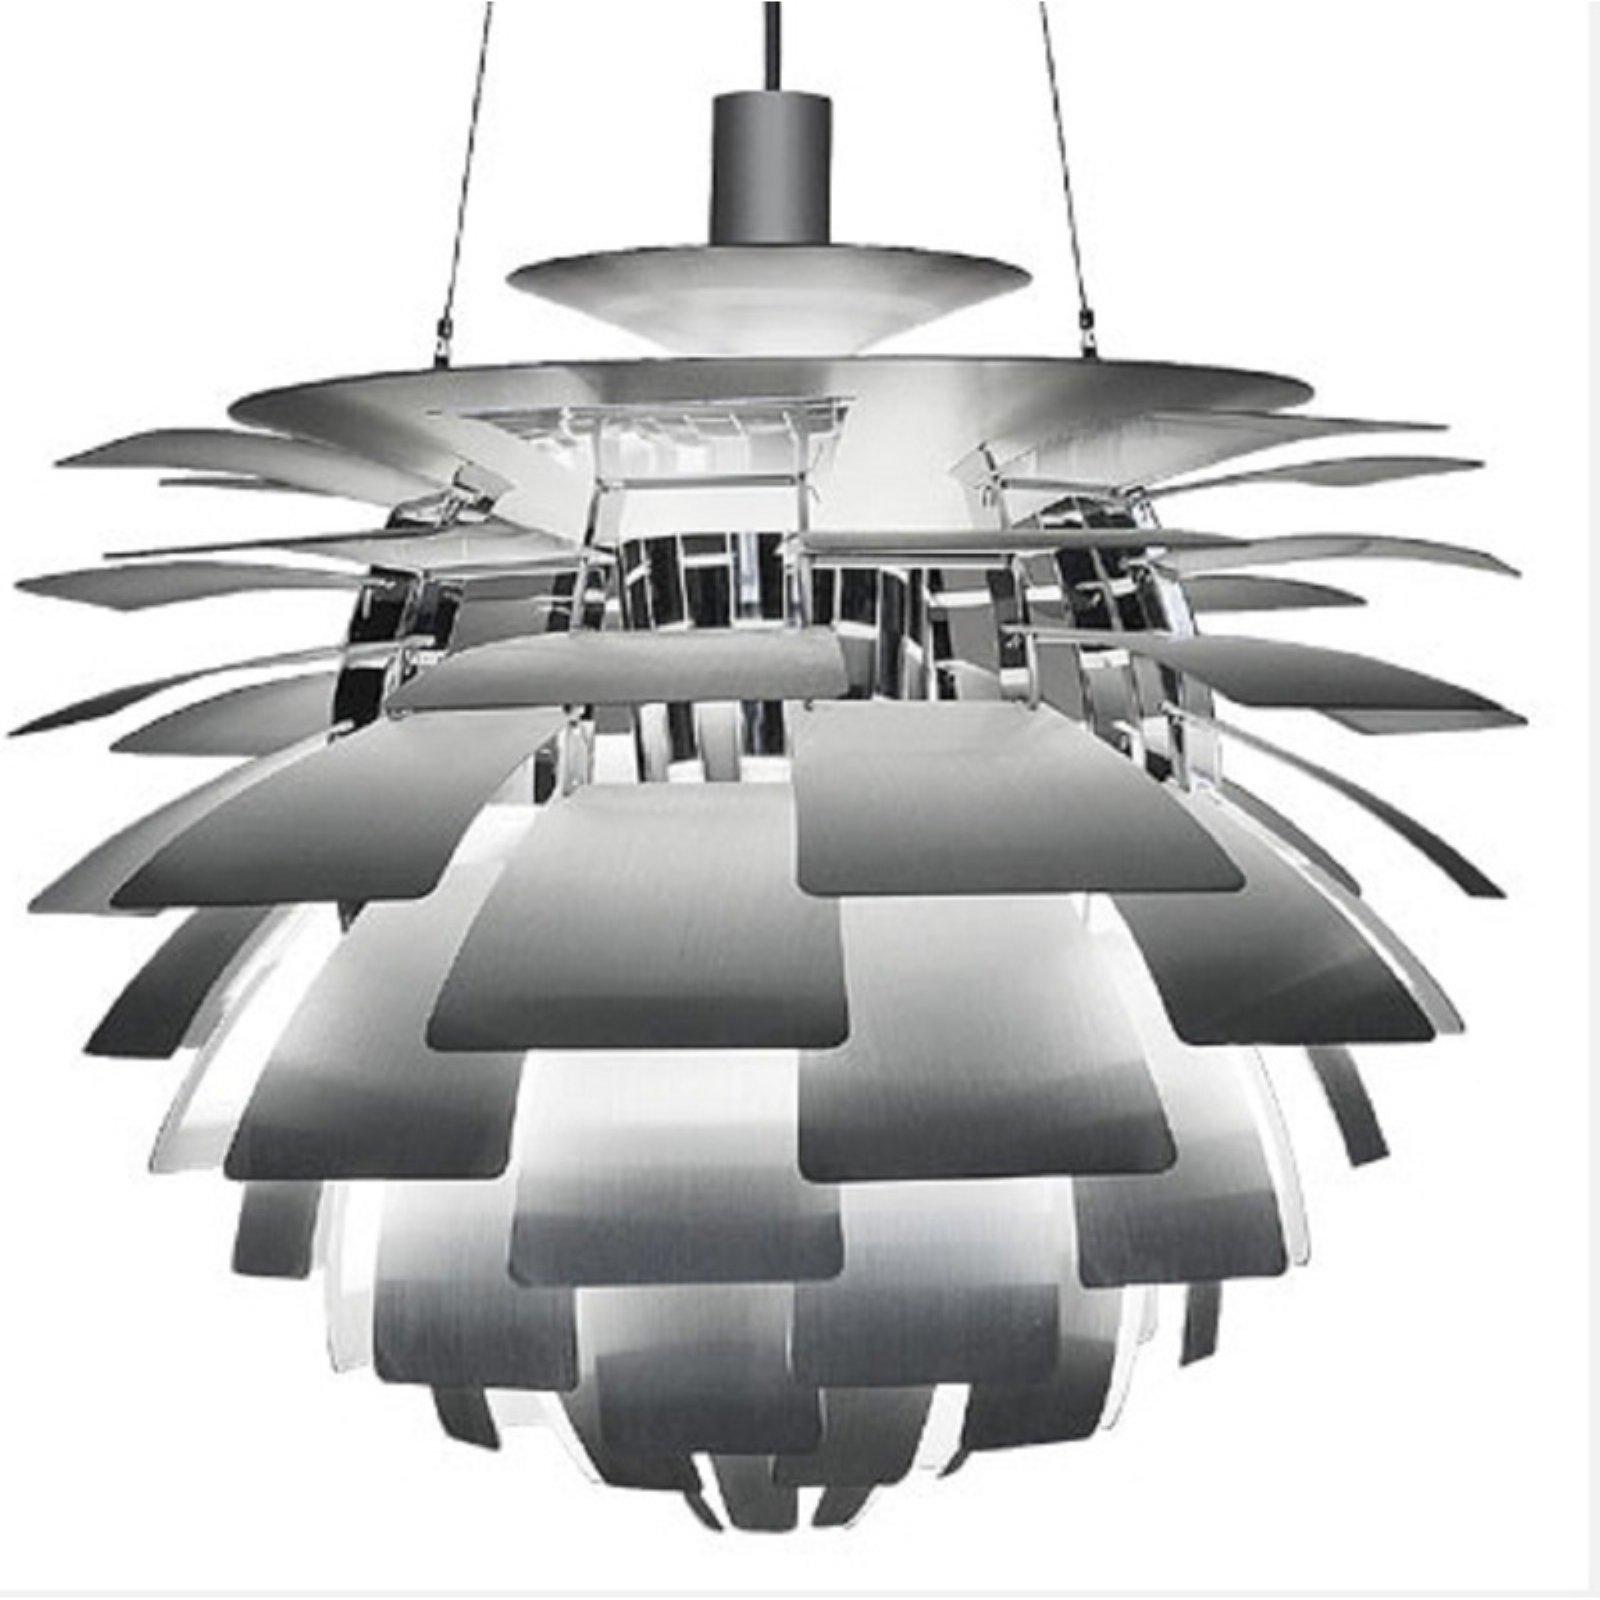 Stilnovo The Artichoke LBC014 Pendant Light